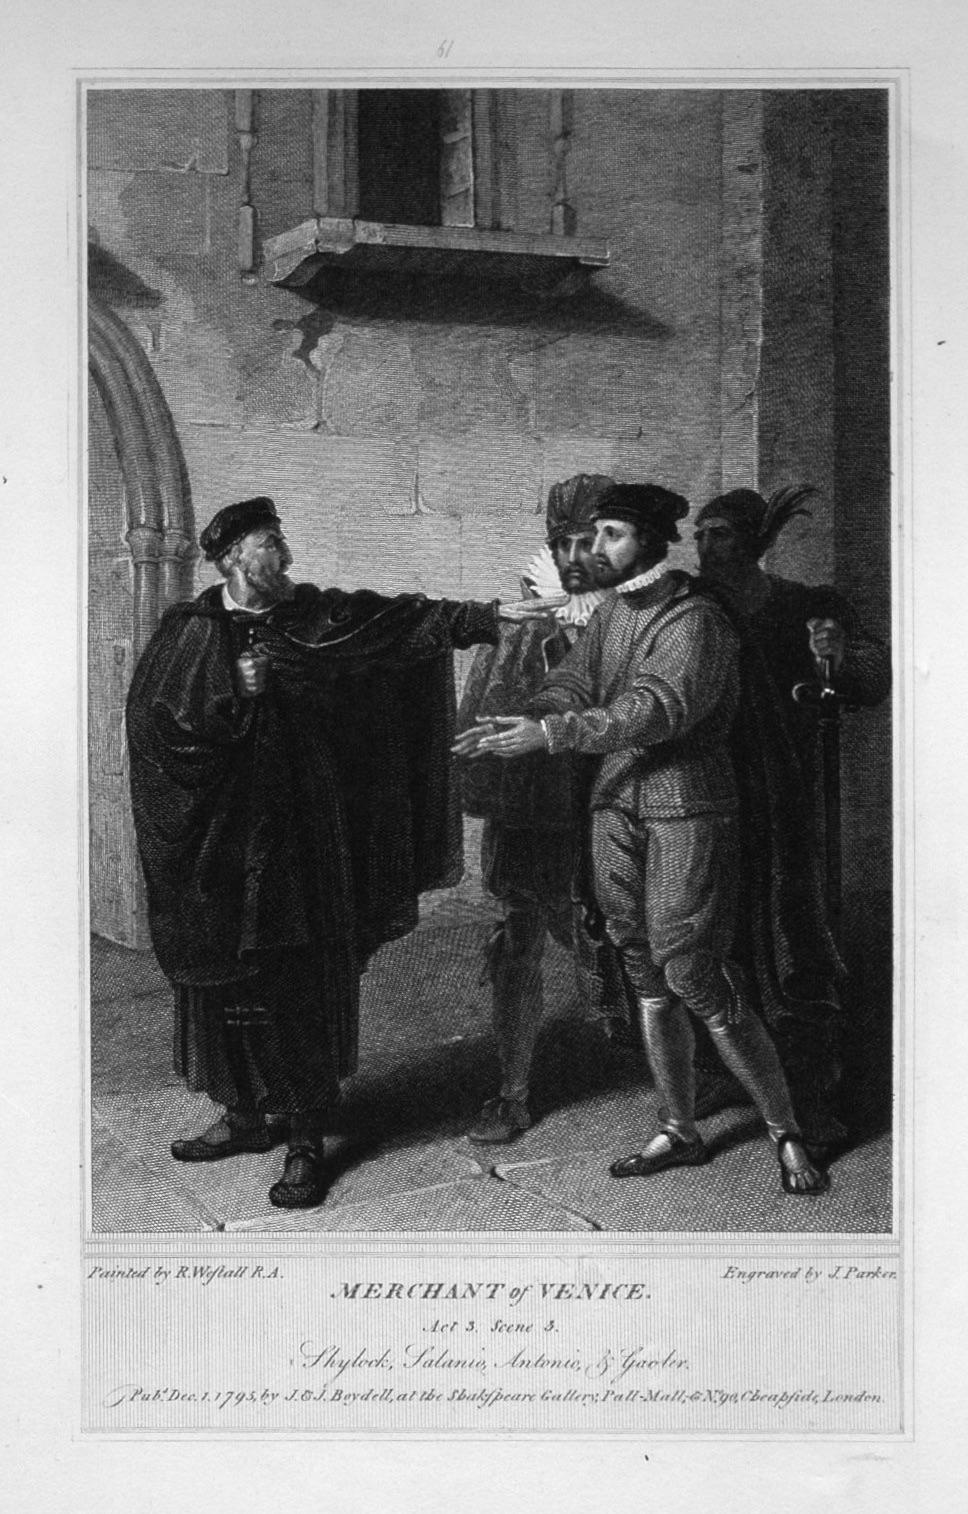 Merchant of Venice.